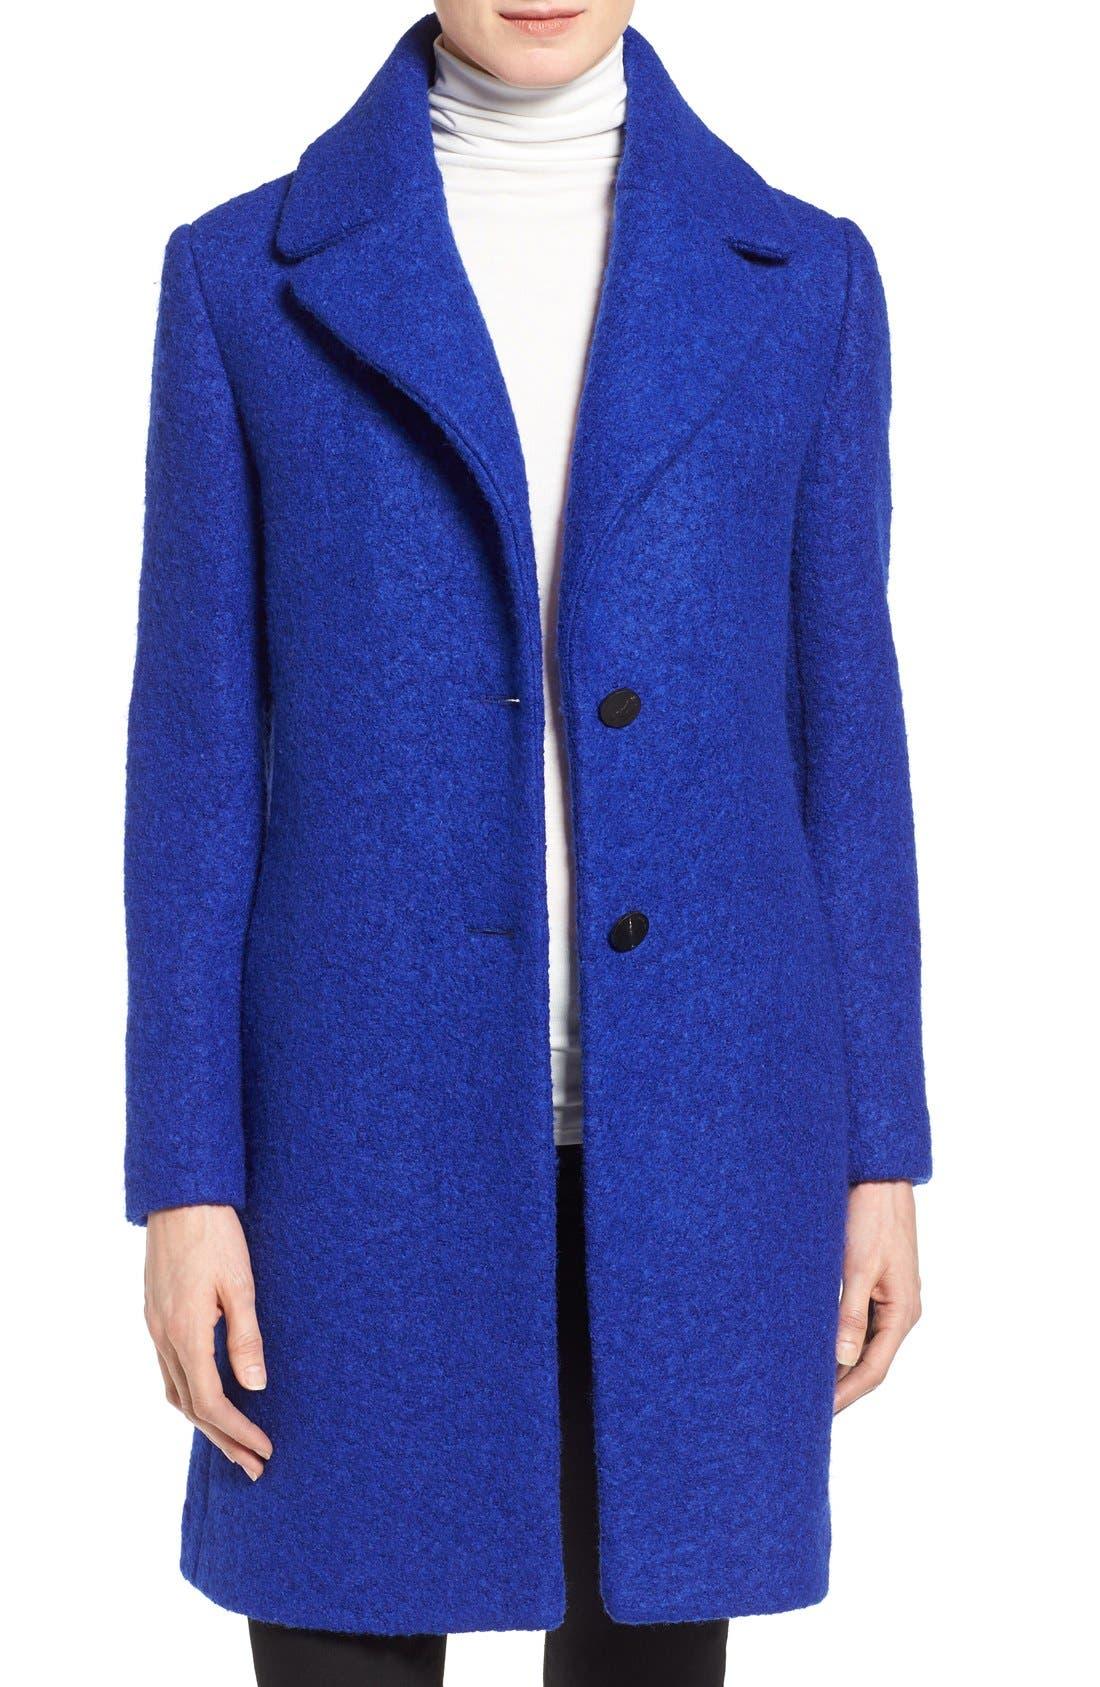 'Tessa' Boiled Wool Blend Coat,                         Main,                         color, Lapis Blue